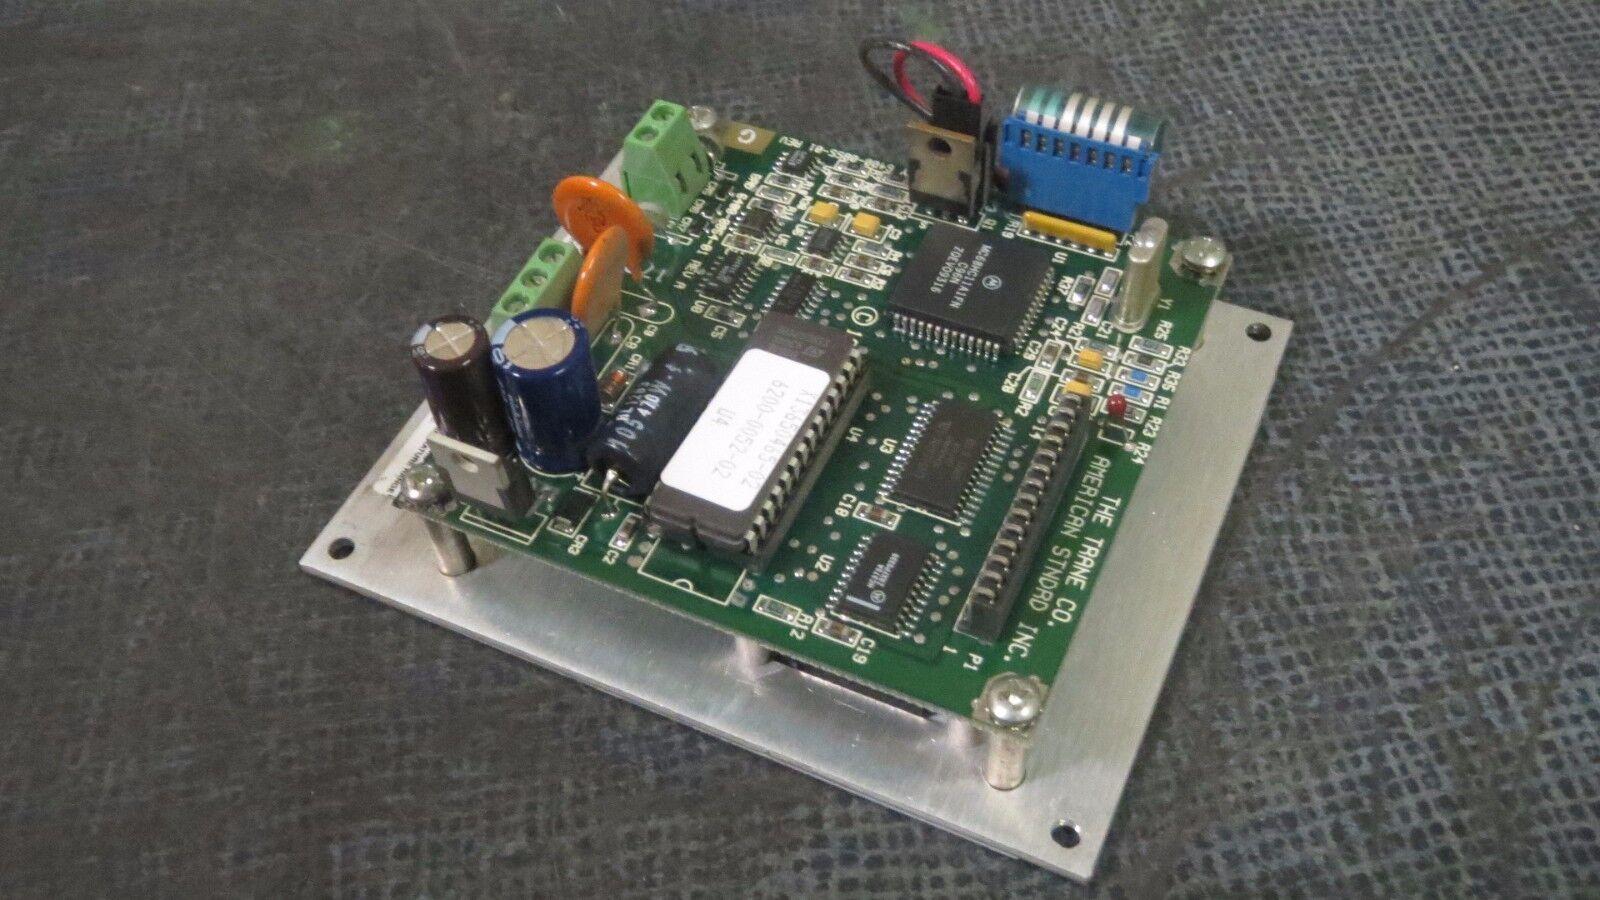 X13650483-02 1 TRANE COMM LINK CHILLER DISPLAY INTERFACE 24 VAC MODEL